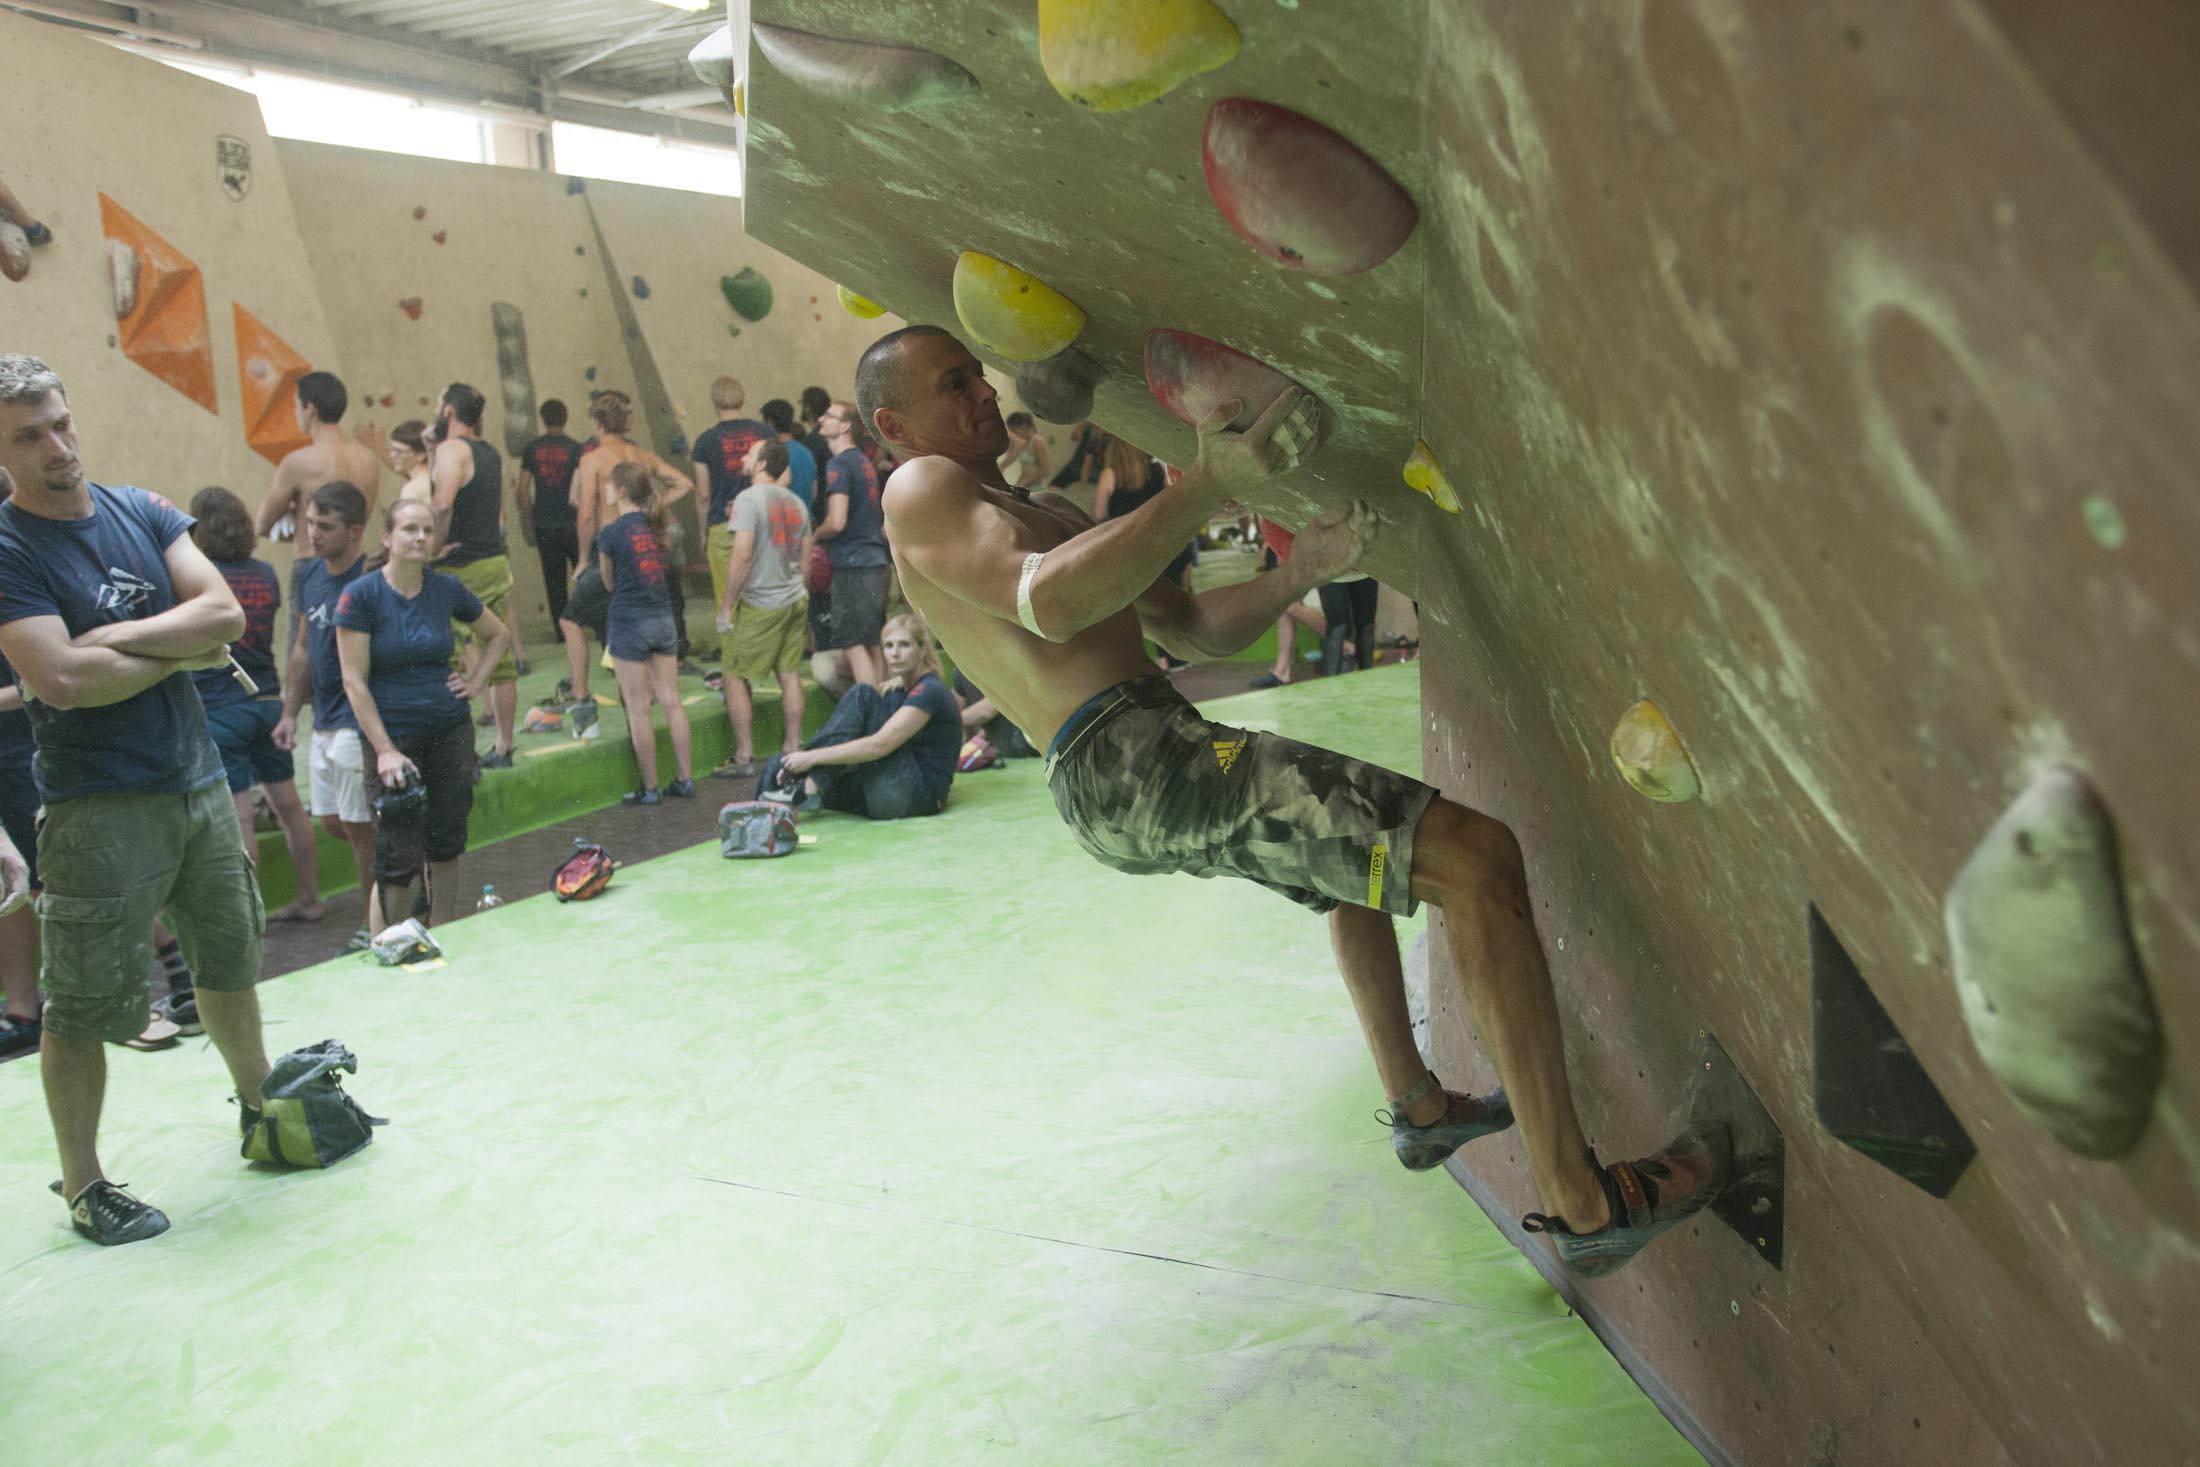 Quali, internationaler bouldercup Frankenjura 2016, BLOCKHELDEN Erlangen, Mammut, Bergfreunde.de, Boulderwettkampf07092016355